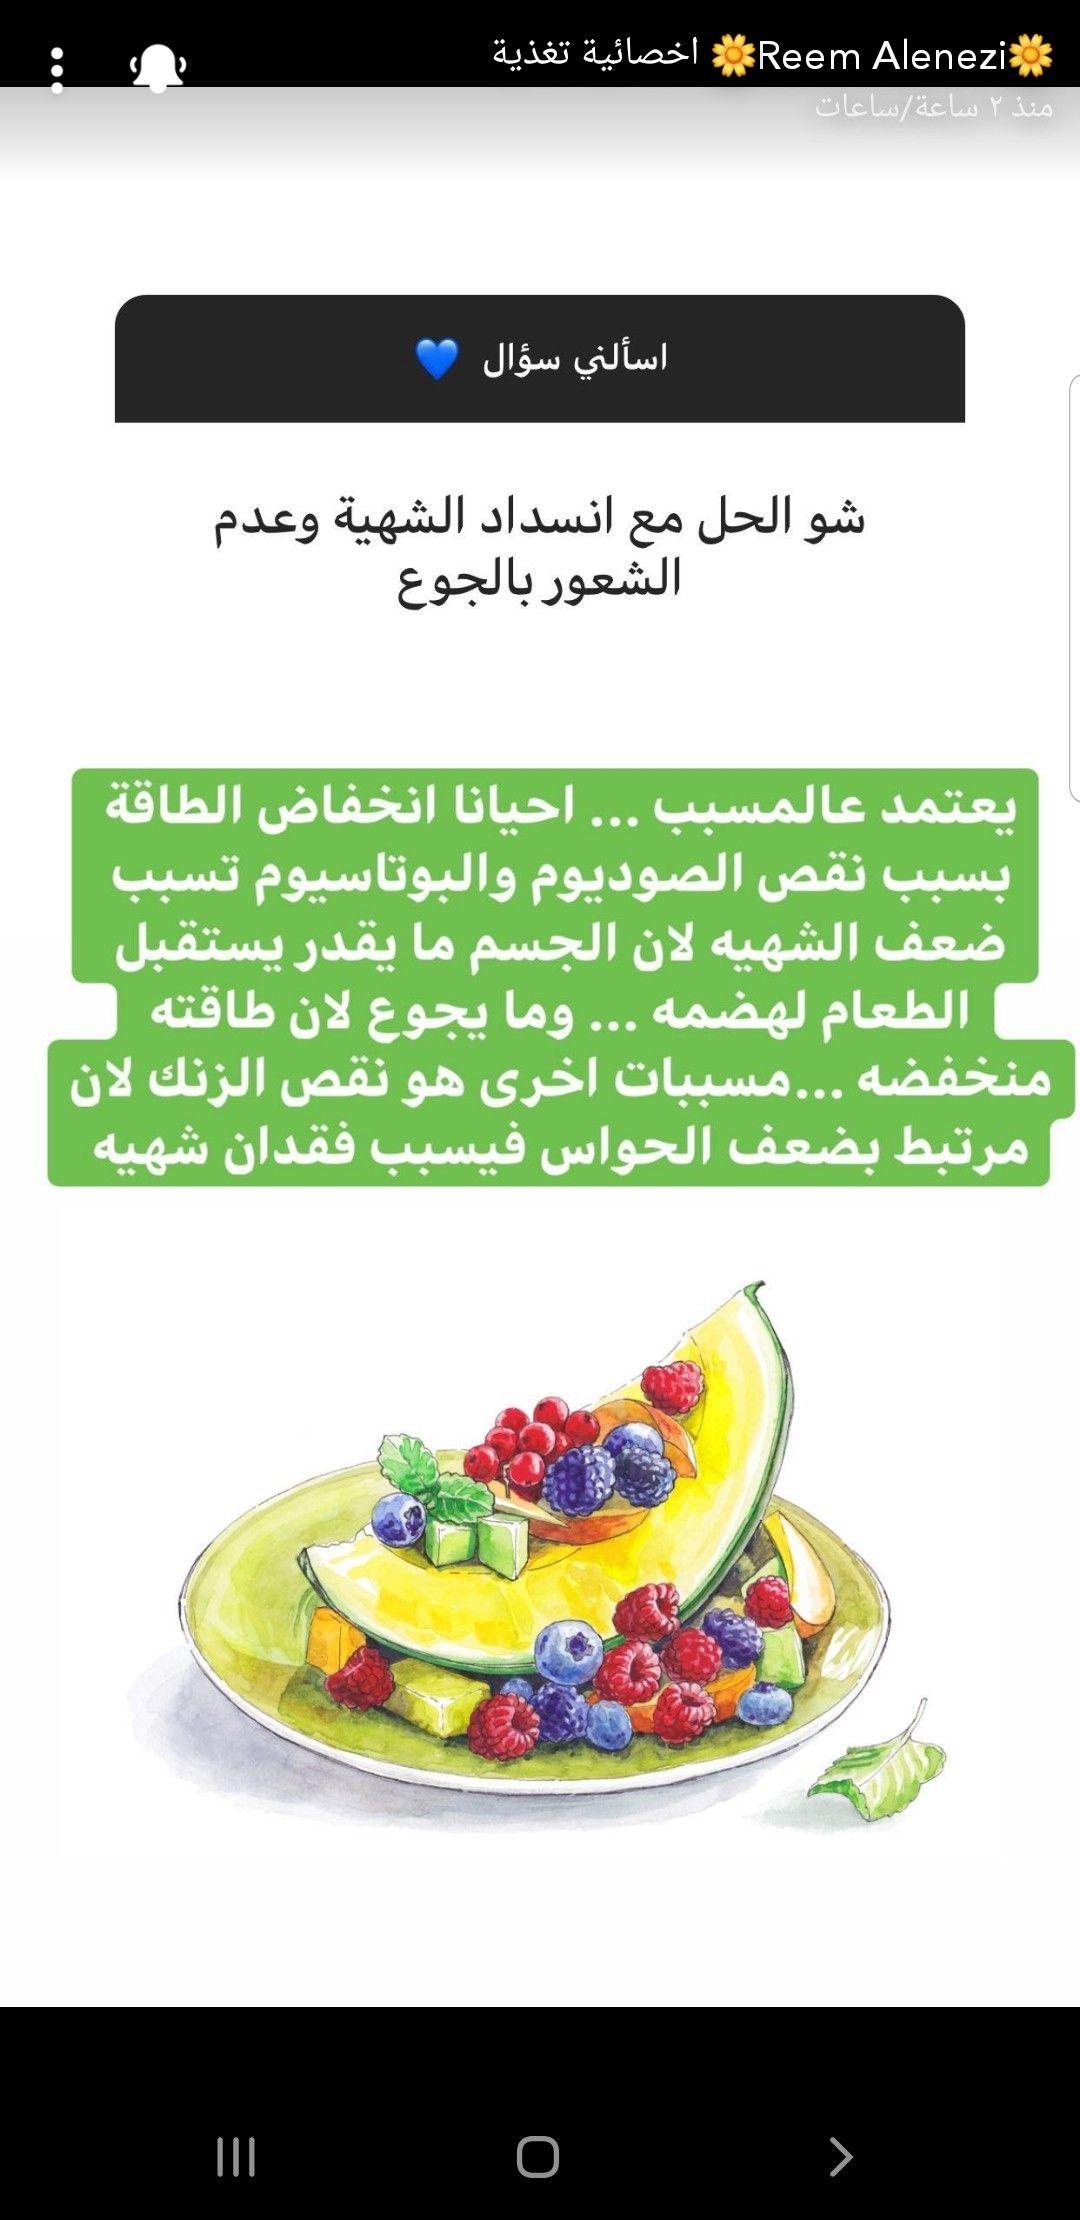 Pin By Aman On تغذية علاجية المعدة بيت الداء و الدواء توعية Healthy Living Food Queen Quotes